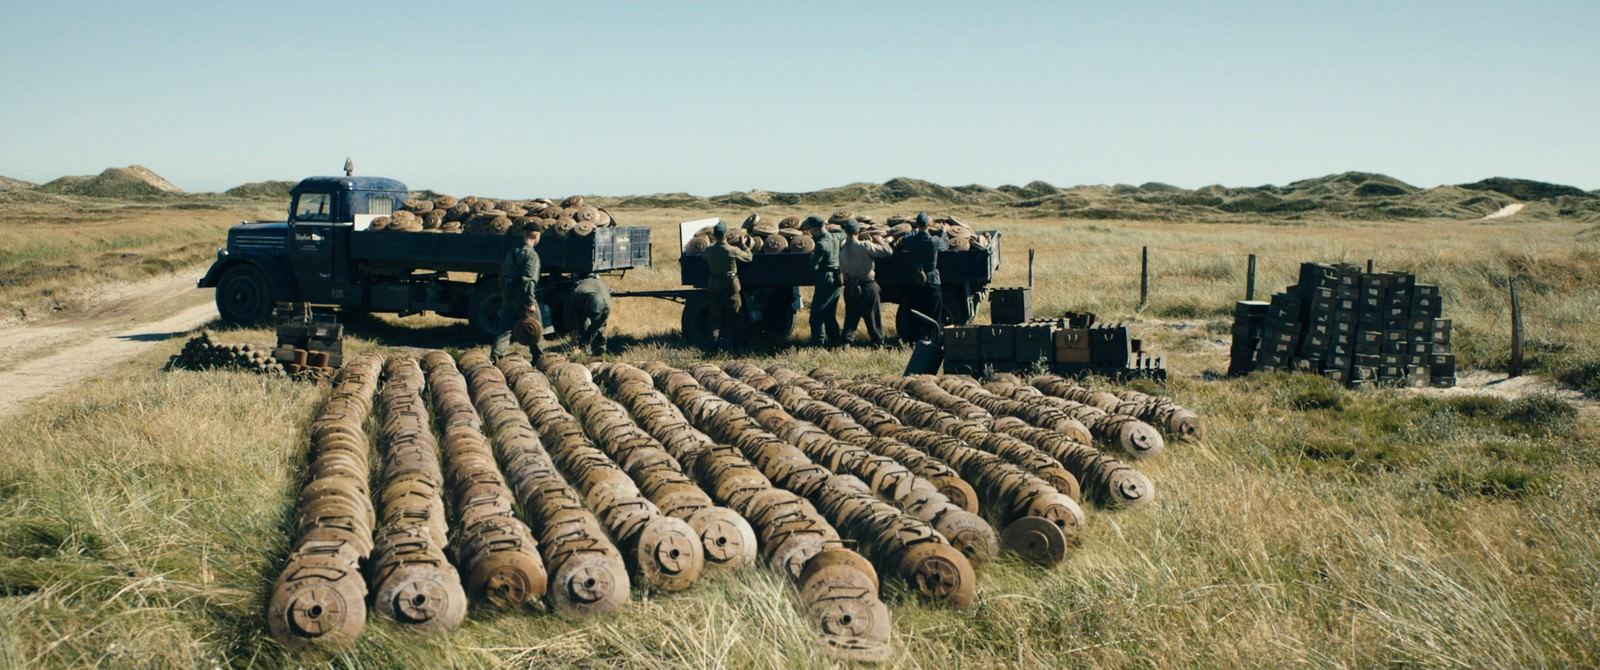 Movie, Under sandet(丹麥, 2016年) / 拆彈少年(台灣) / 十個拆彈的少年(香港) / Land of Mine(英文) / 地雷区(網路), 電影劇照